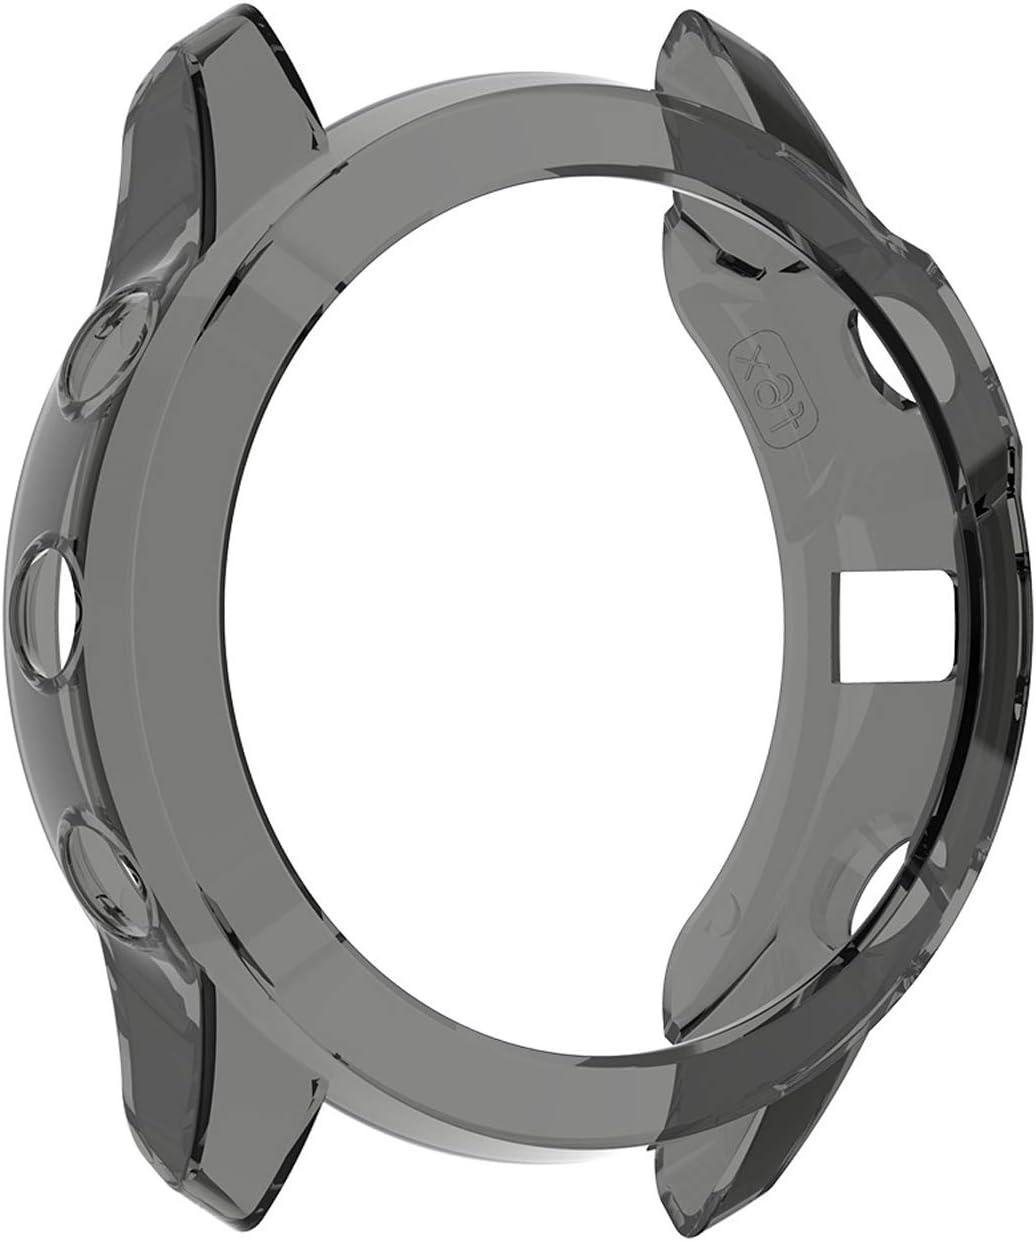 lamshaw Silicone TPU Case Cover for Garmin Fenix 6X Pro//Fenix 6X Pro Solar//Fenix 6X Sapphire 2 Pack-Black case, Fenix 6X Series for Garmin Fenix 6X Pro Case